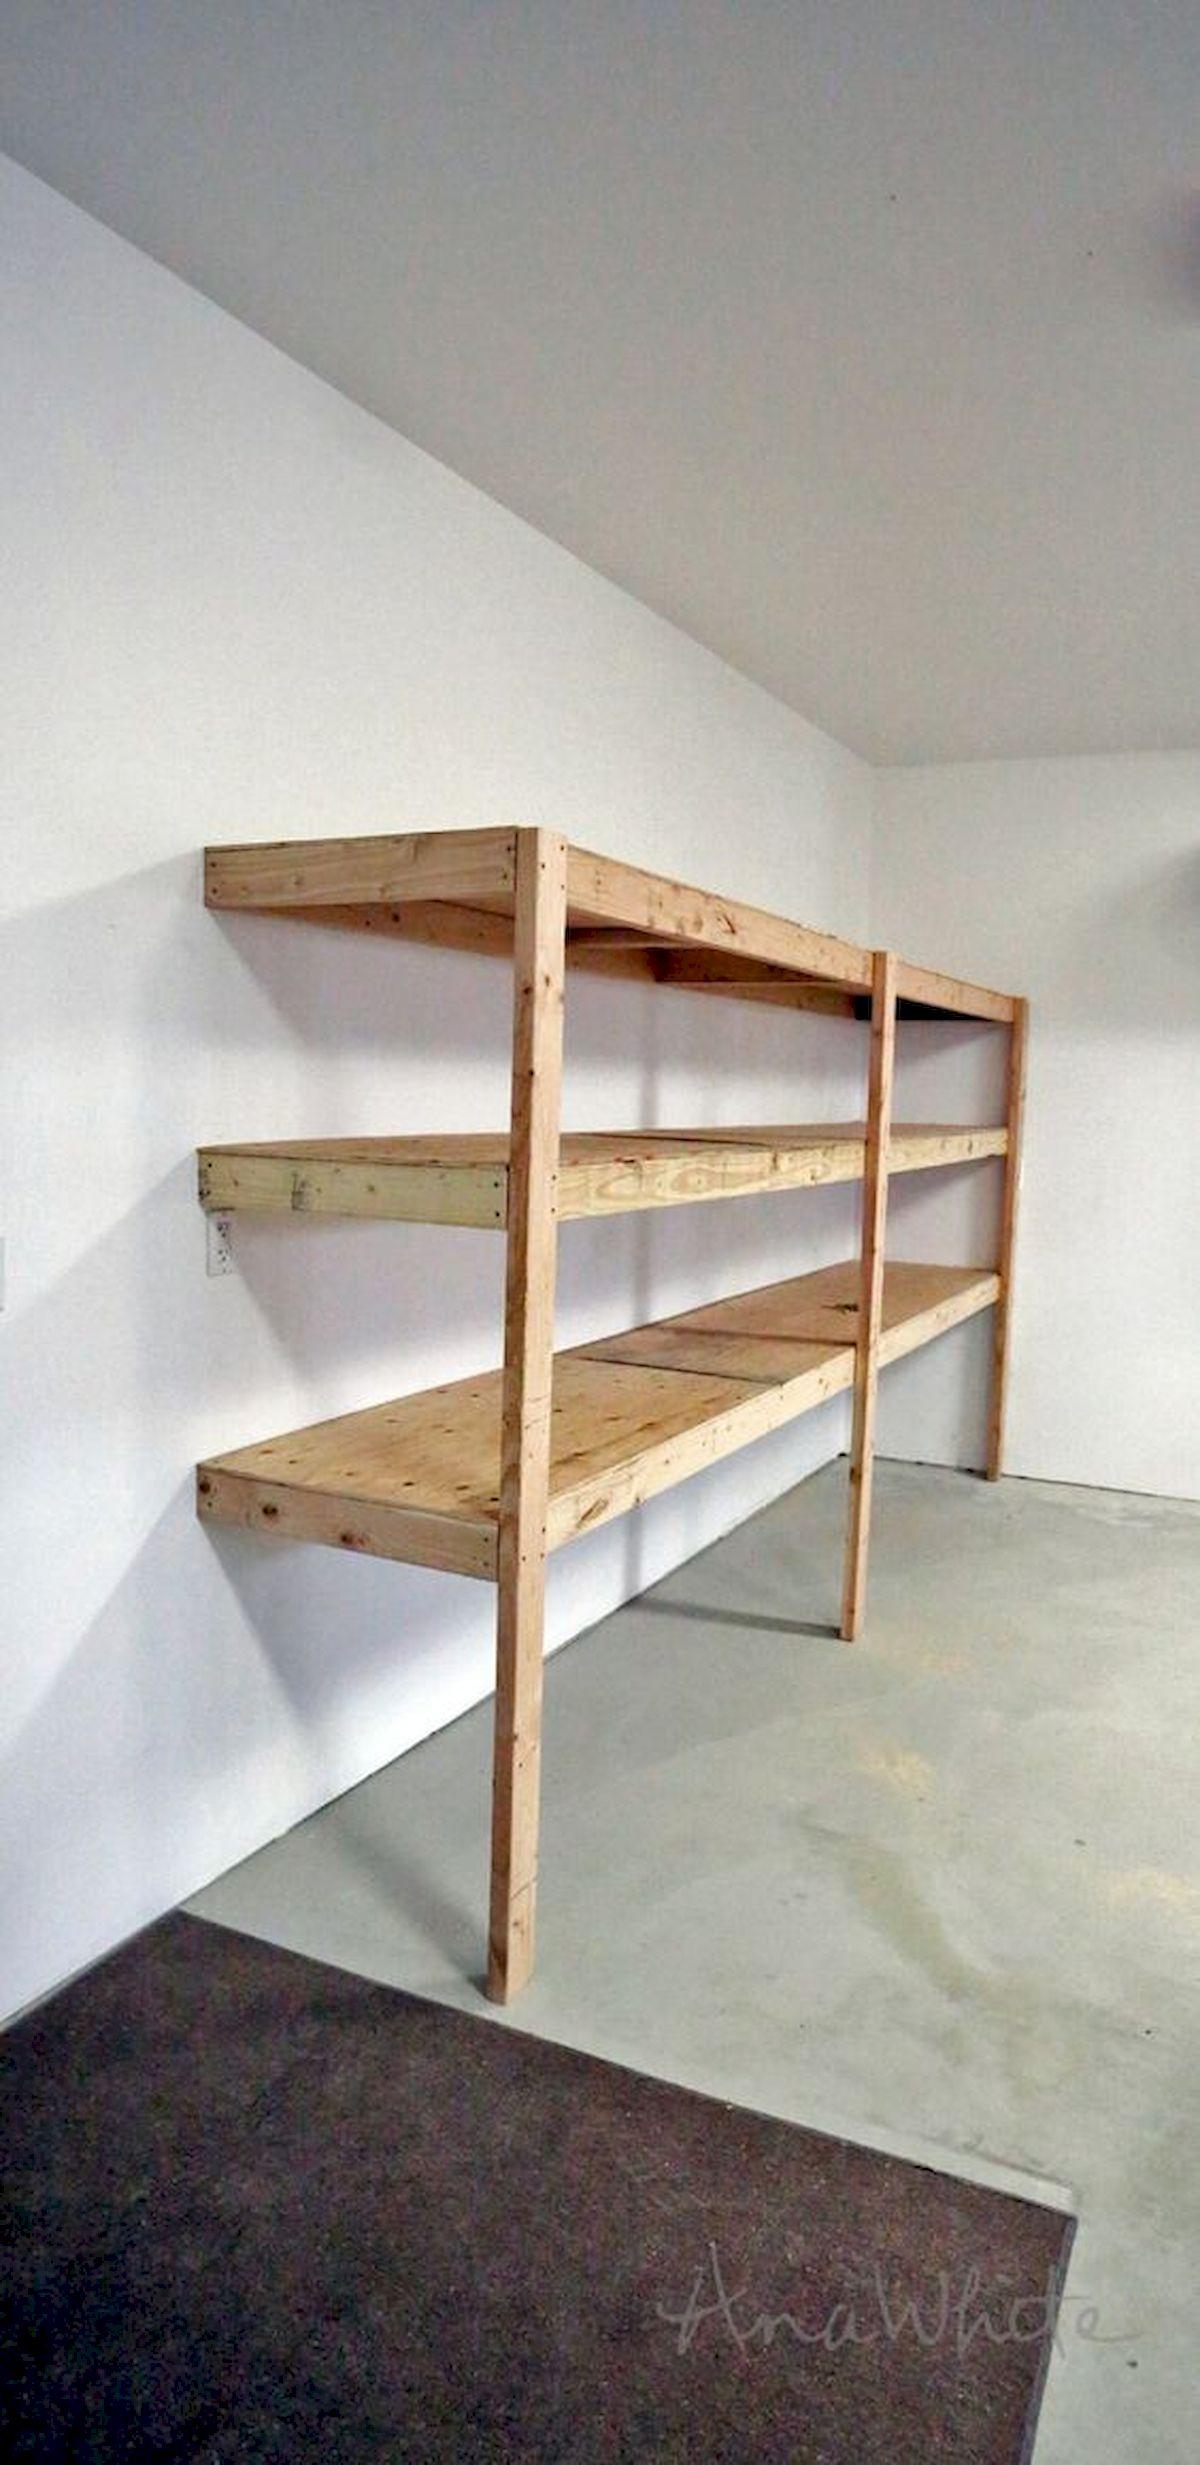 40 Inspiring DIY Garage Storage Design Ideas On A Budget (10)